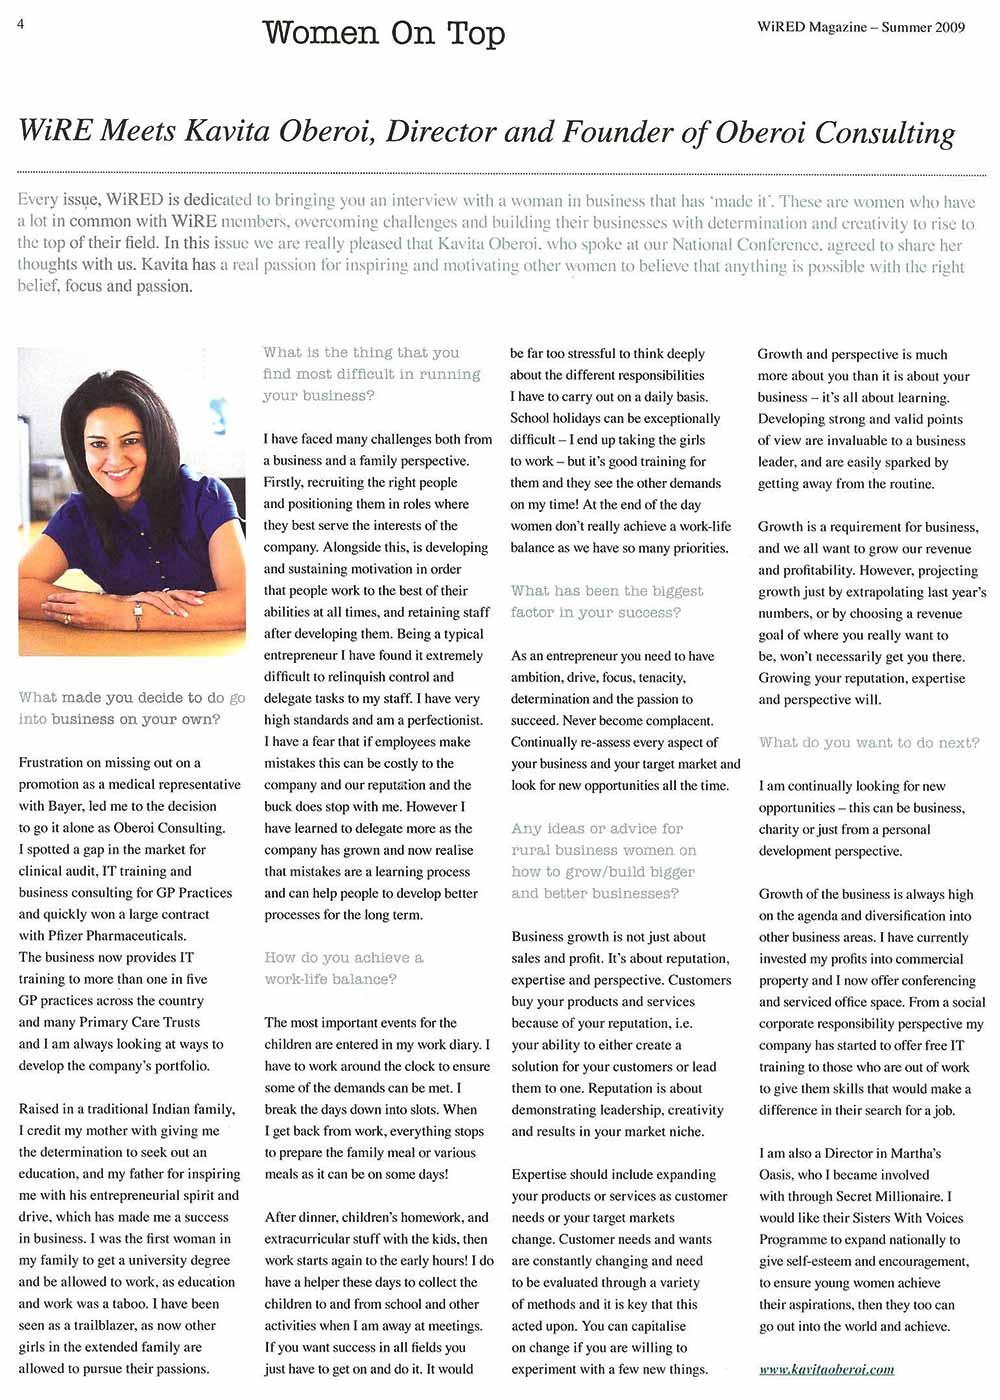 Women On Top - WiRE Meets Kavita Oberoi